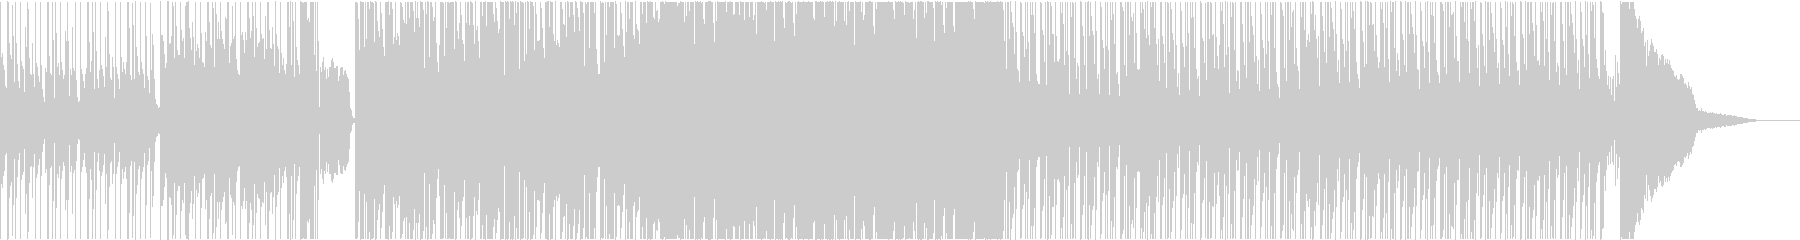 EDM anime アニメ 爽やか 動画の未再生の波形